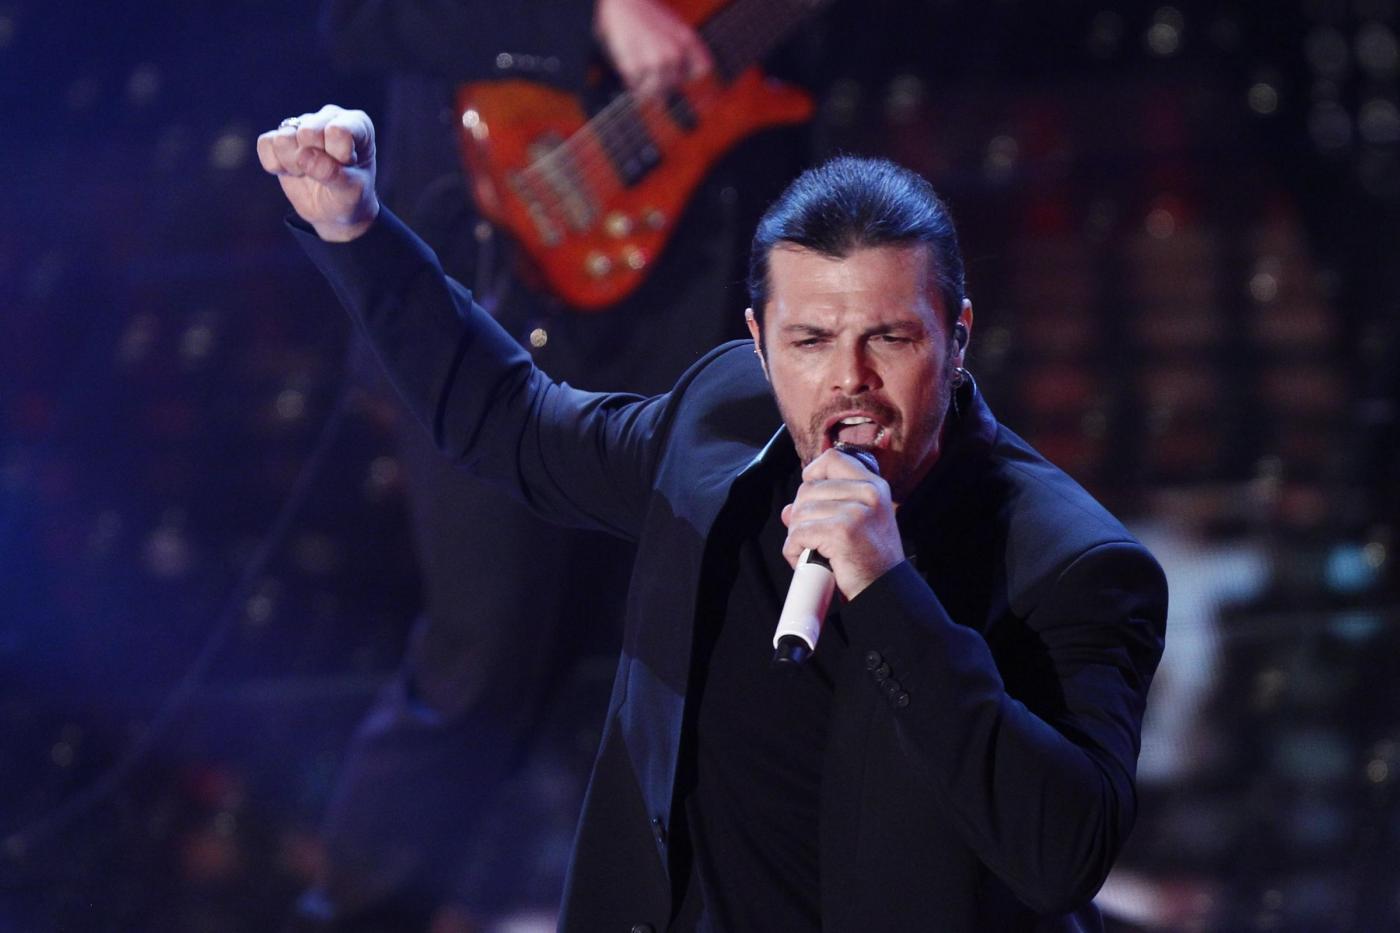 Gianluca Grignani, polemica per il concerto: 'È una pagliacciata'